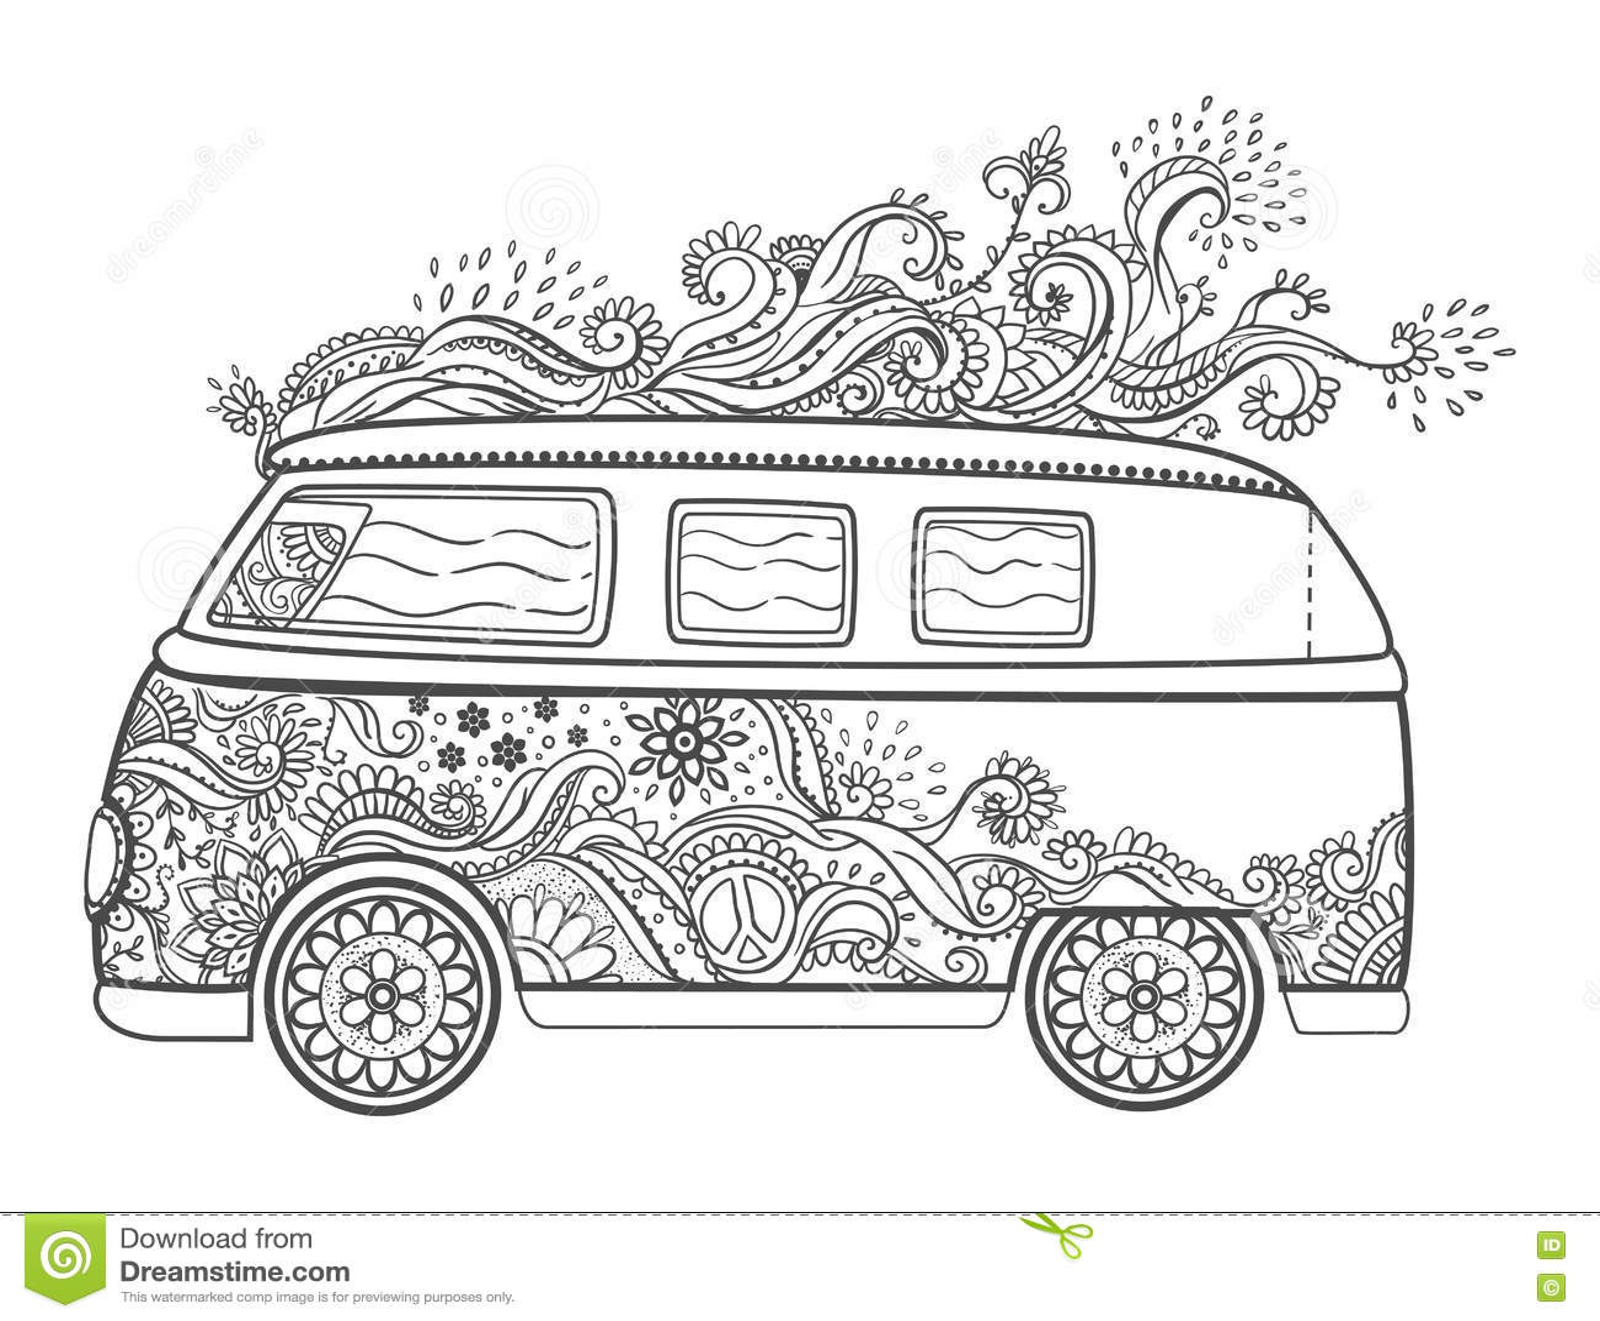 Volkswagen Cartoons Illustrations Amp Vector Stock Images